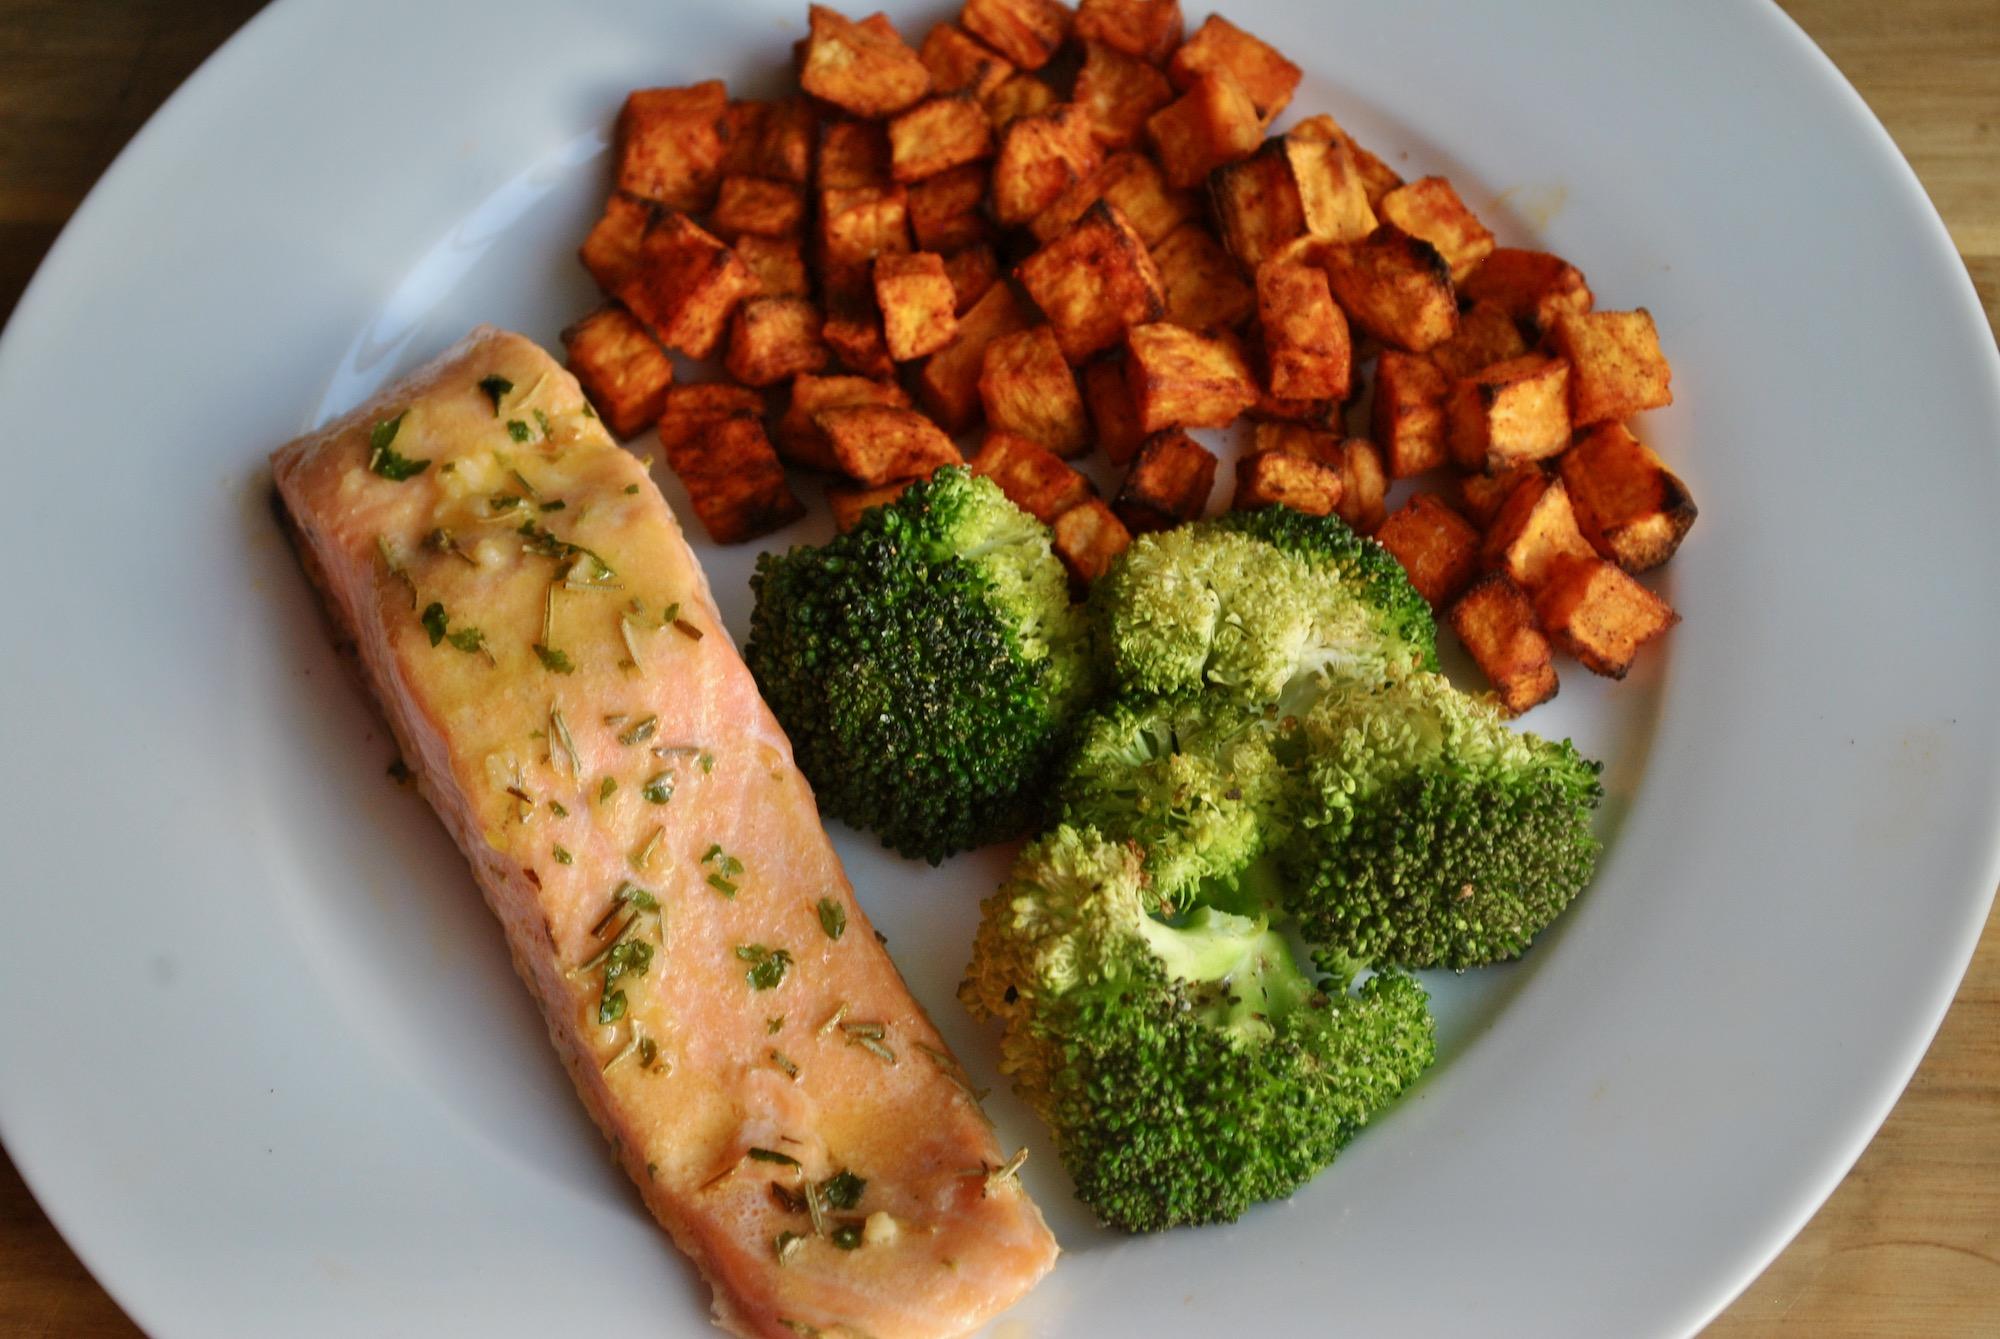 Healthy Baked Lemon Salmon With Sweet Potato Broccoli Recipe Student Recipes Student Eats